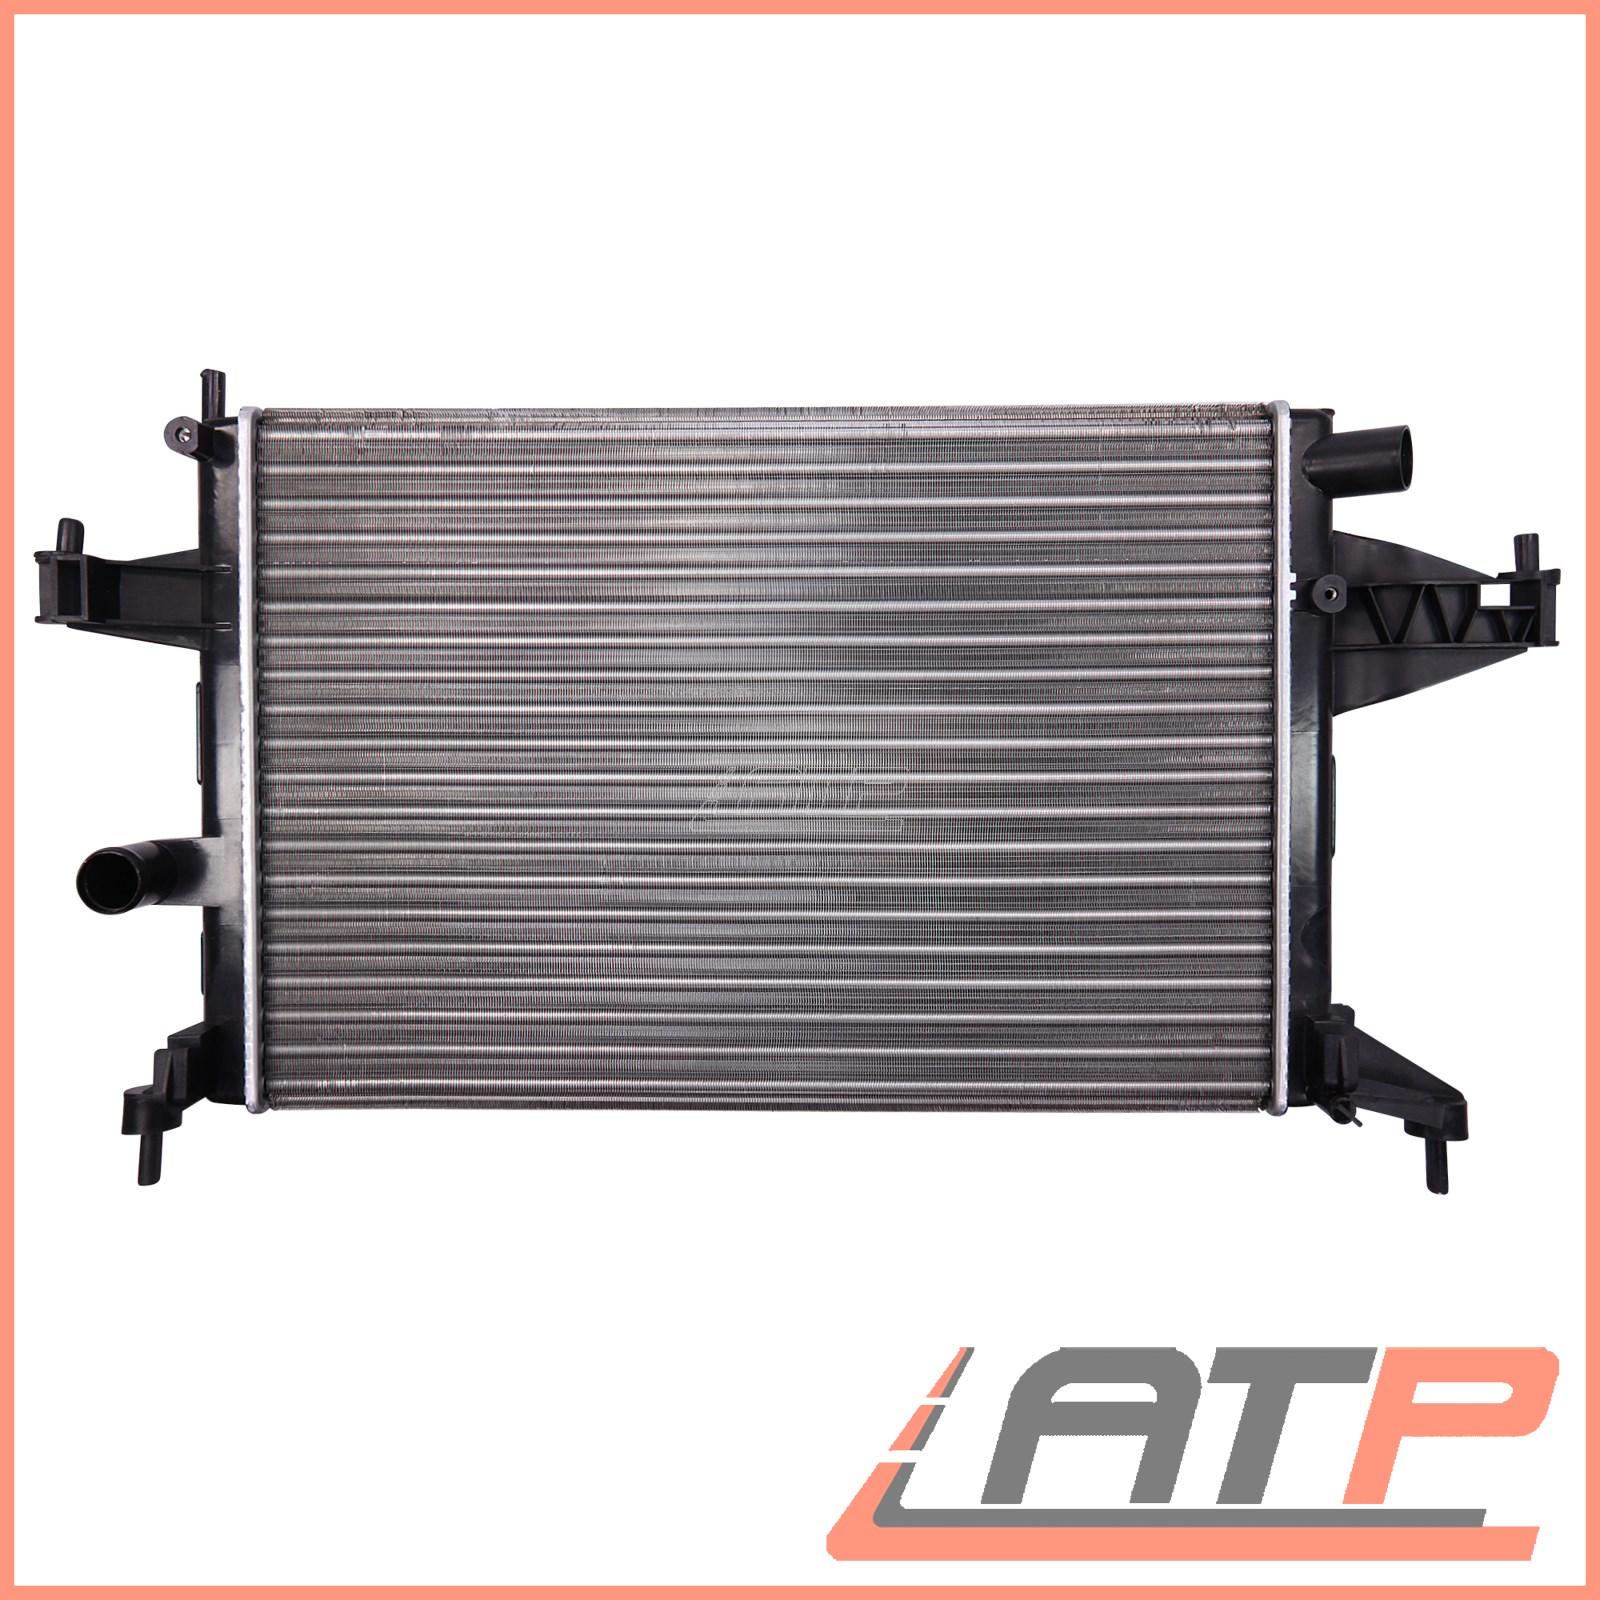 Opel Engine Cooling Diagram Wiring Diagrams Radiator Manual Vauxhall Corsa C 1 4 Atomic